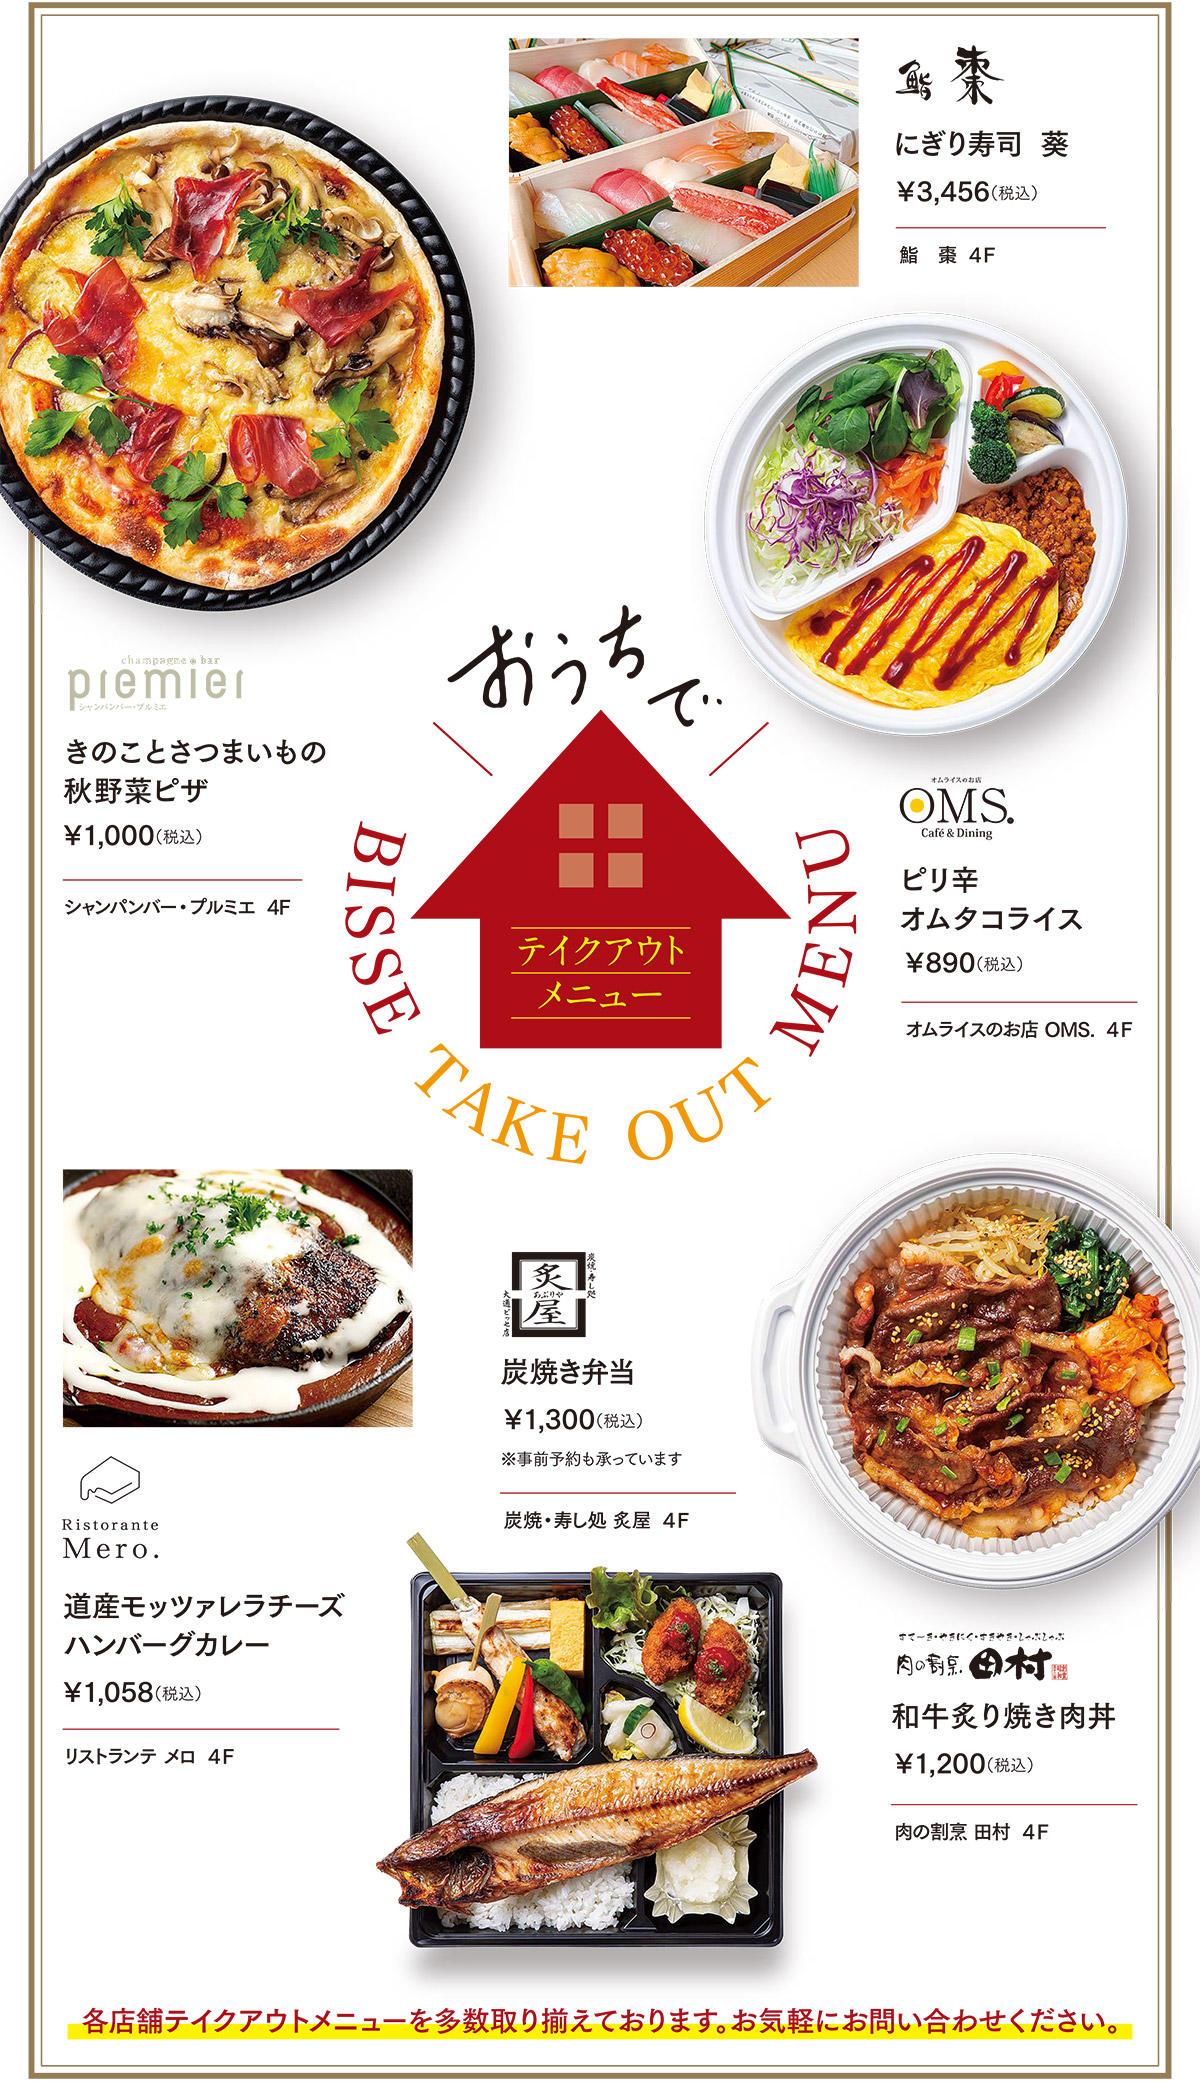 https://www.odori-bisse.com/info/news_210816_img3.jpg